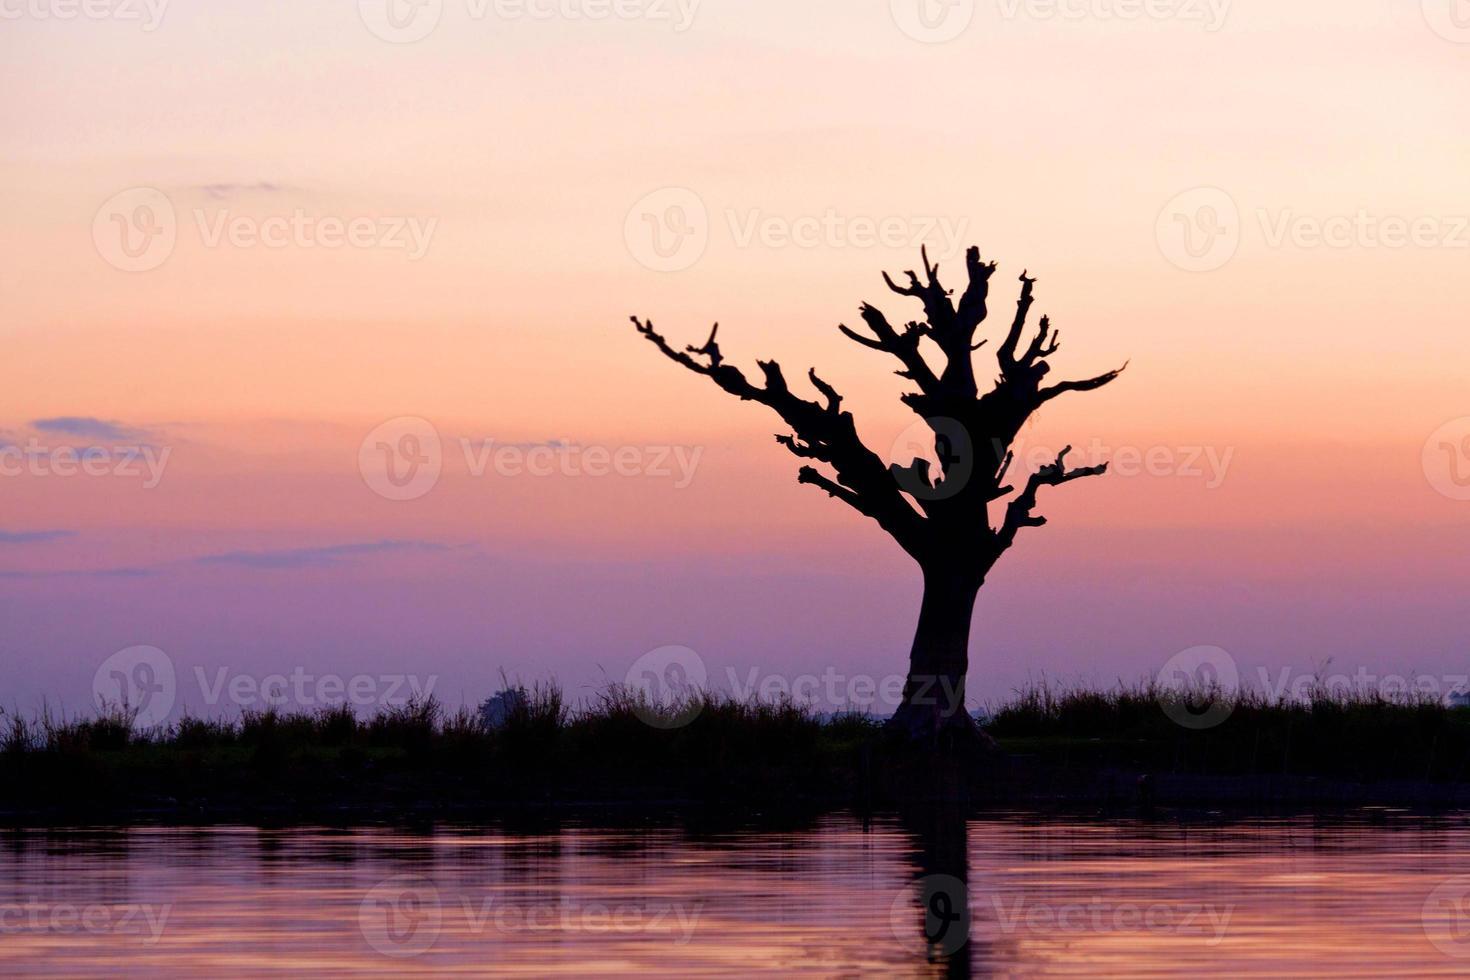 Sunset on Taungthaman lake, Myanmar photo